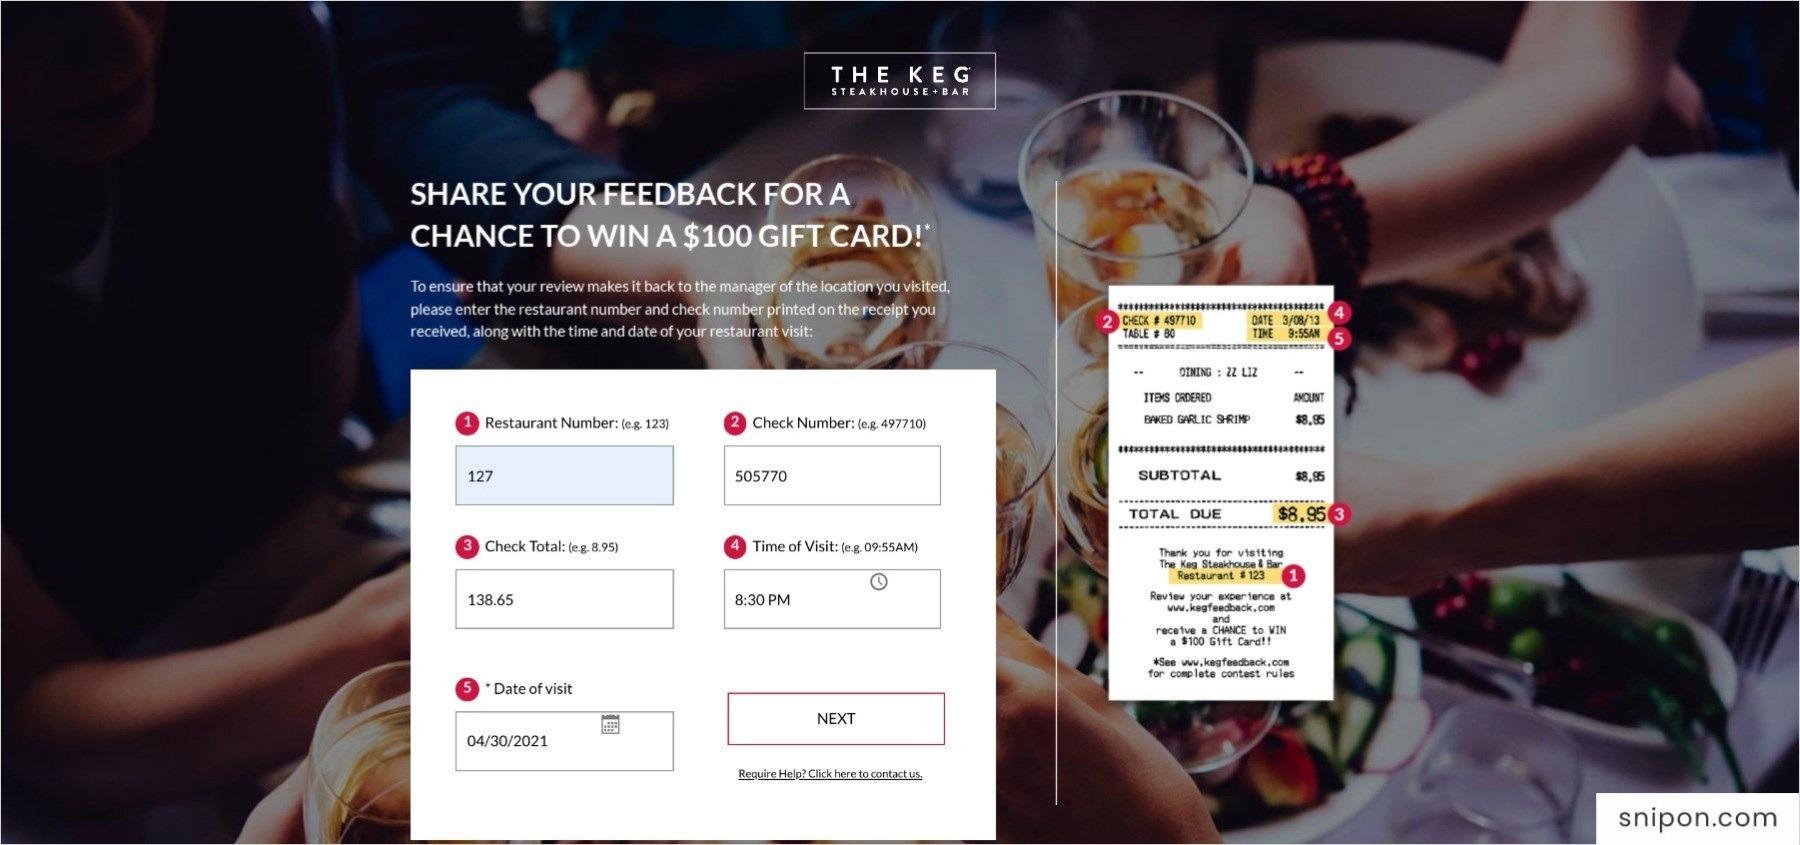 Enter Information - The Keg Feedback Survey